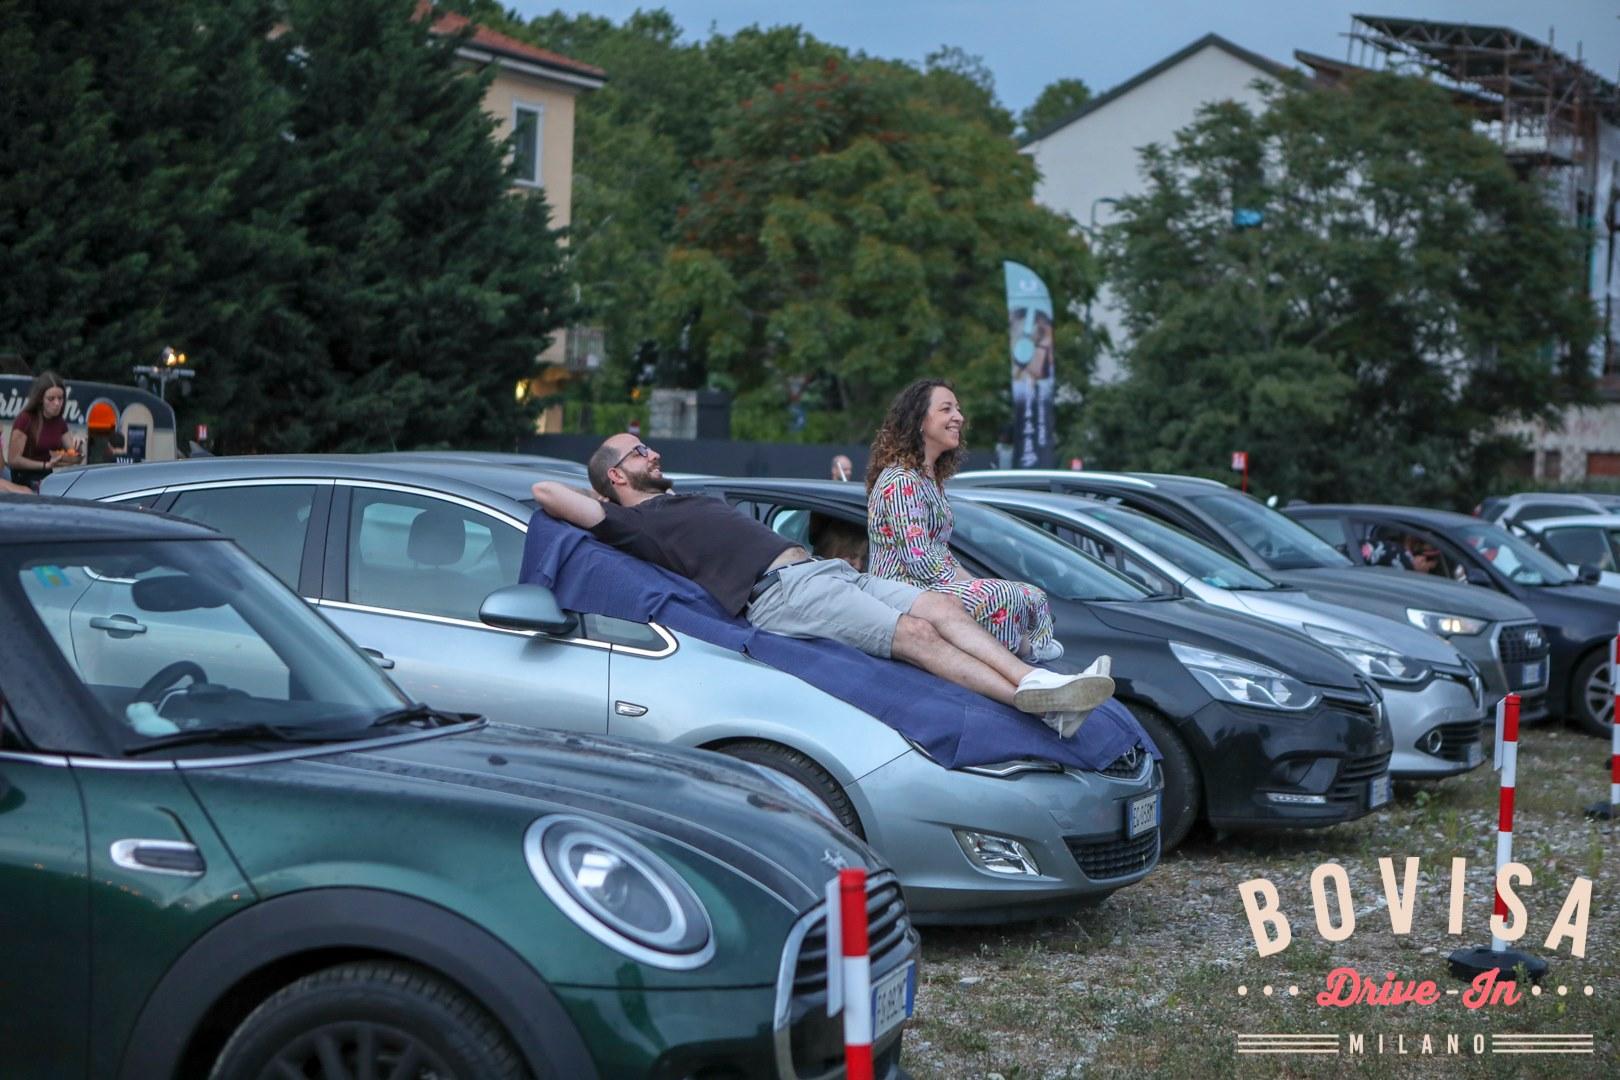 Bovisa Drive-In Opening Party YOUparti next event 5-6-7 Luglio 2019 milano